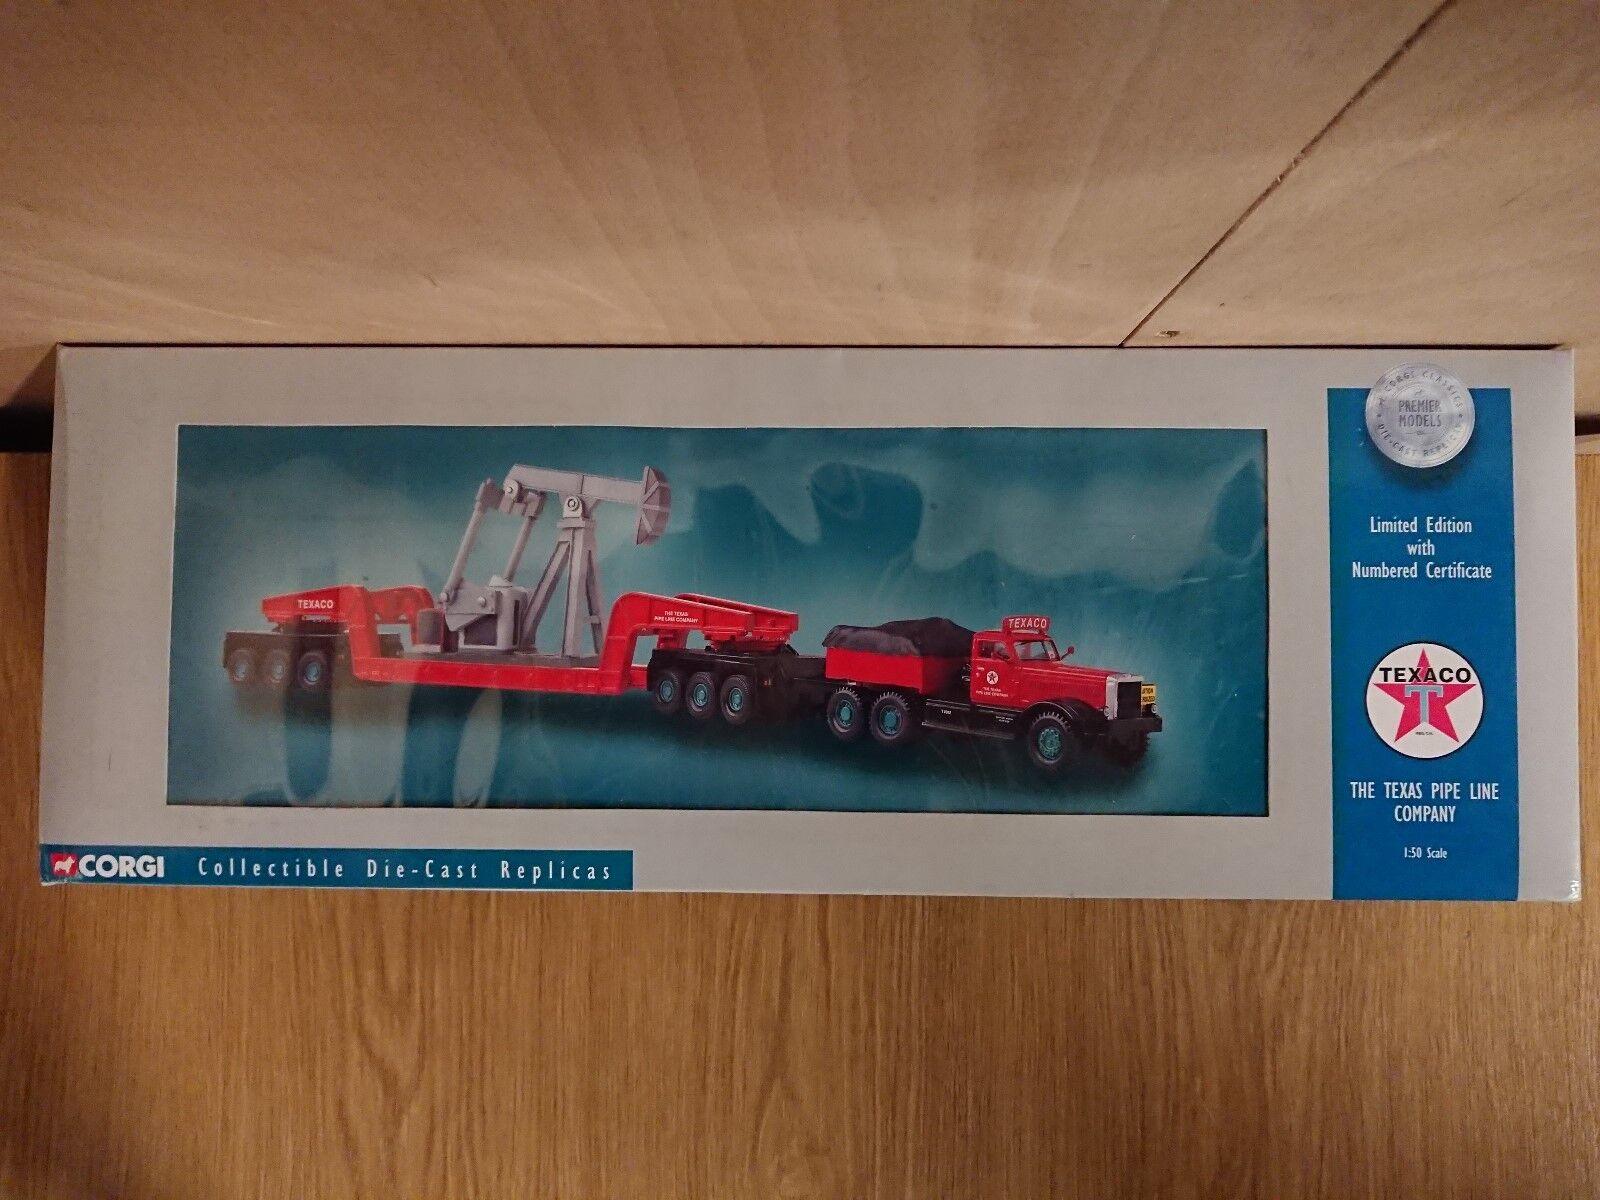 Corgi 55304 Diamond T980 Girder Trailer Nodding Donkey Ltd Ed No. 0001 of 3000